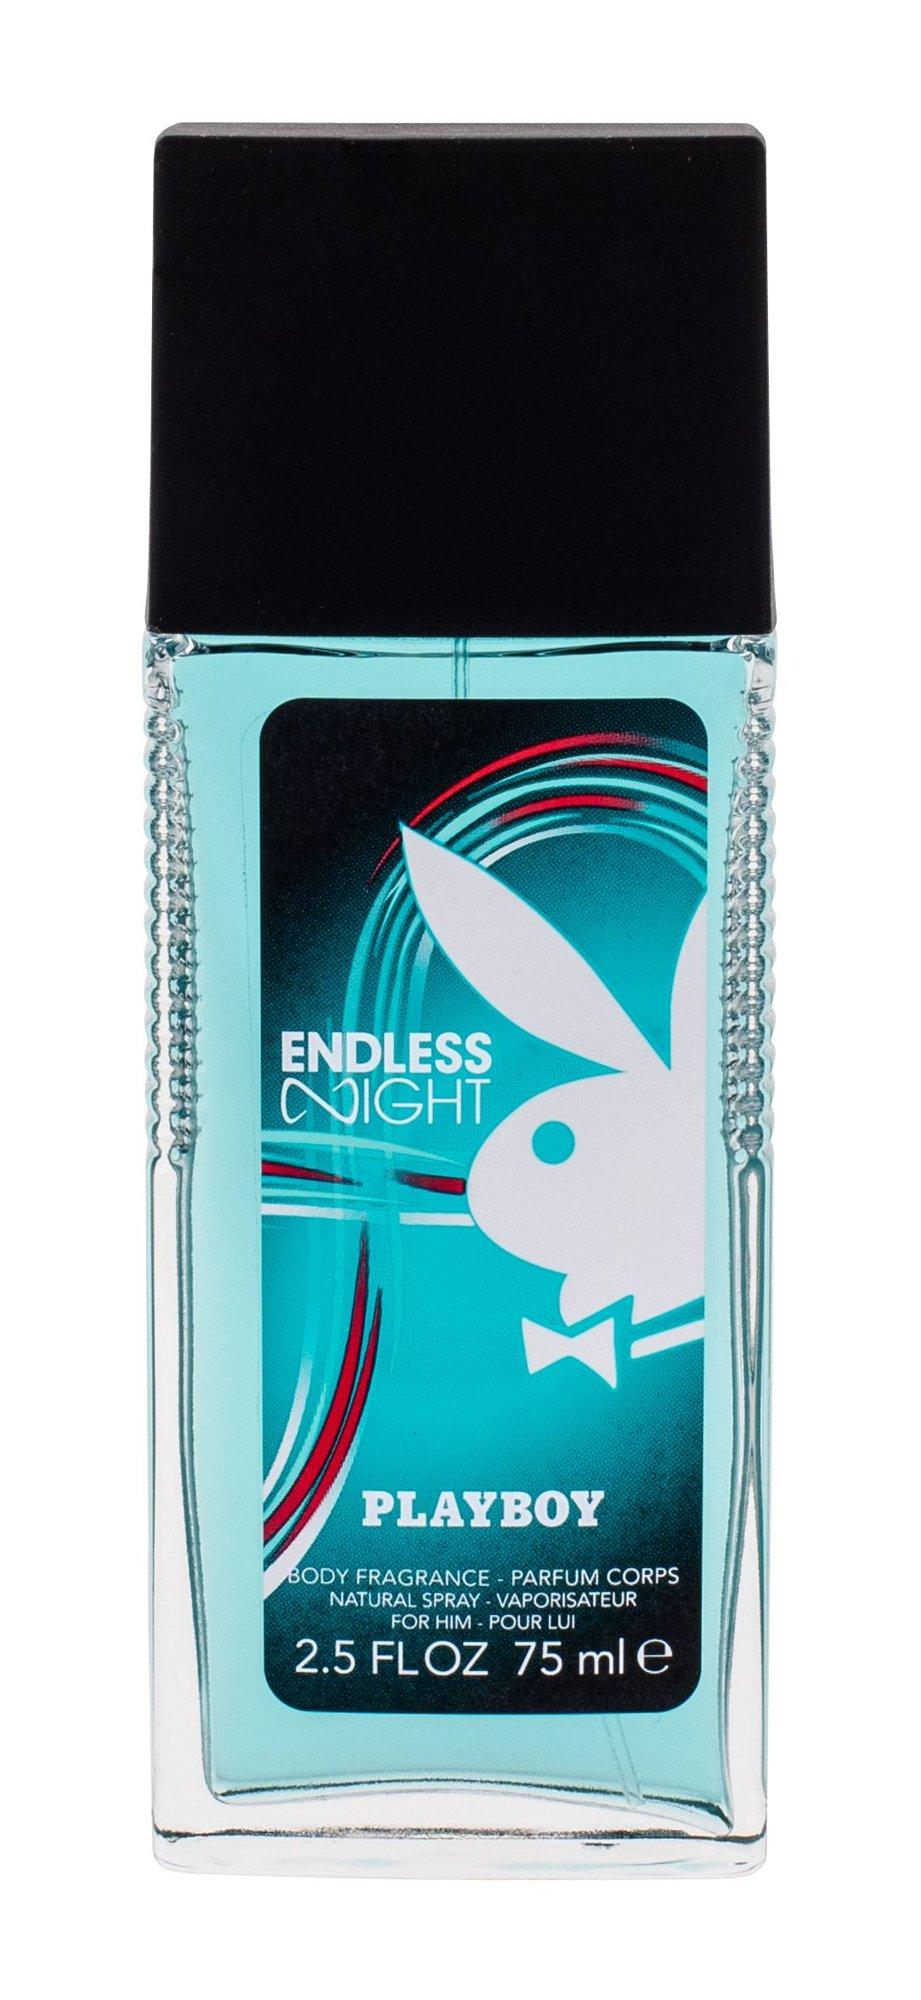 Playboy Endless Night Deodorant 75ml